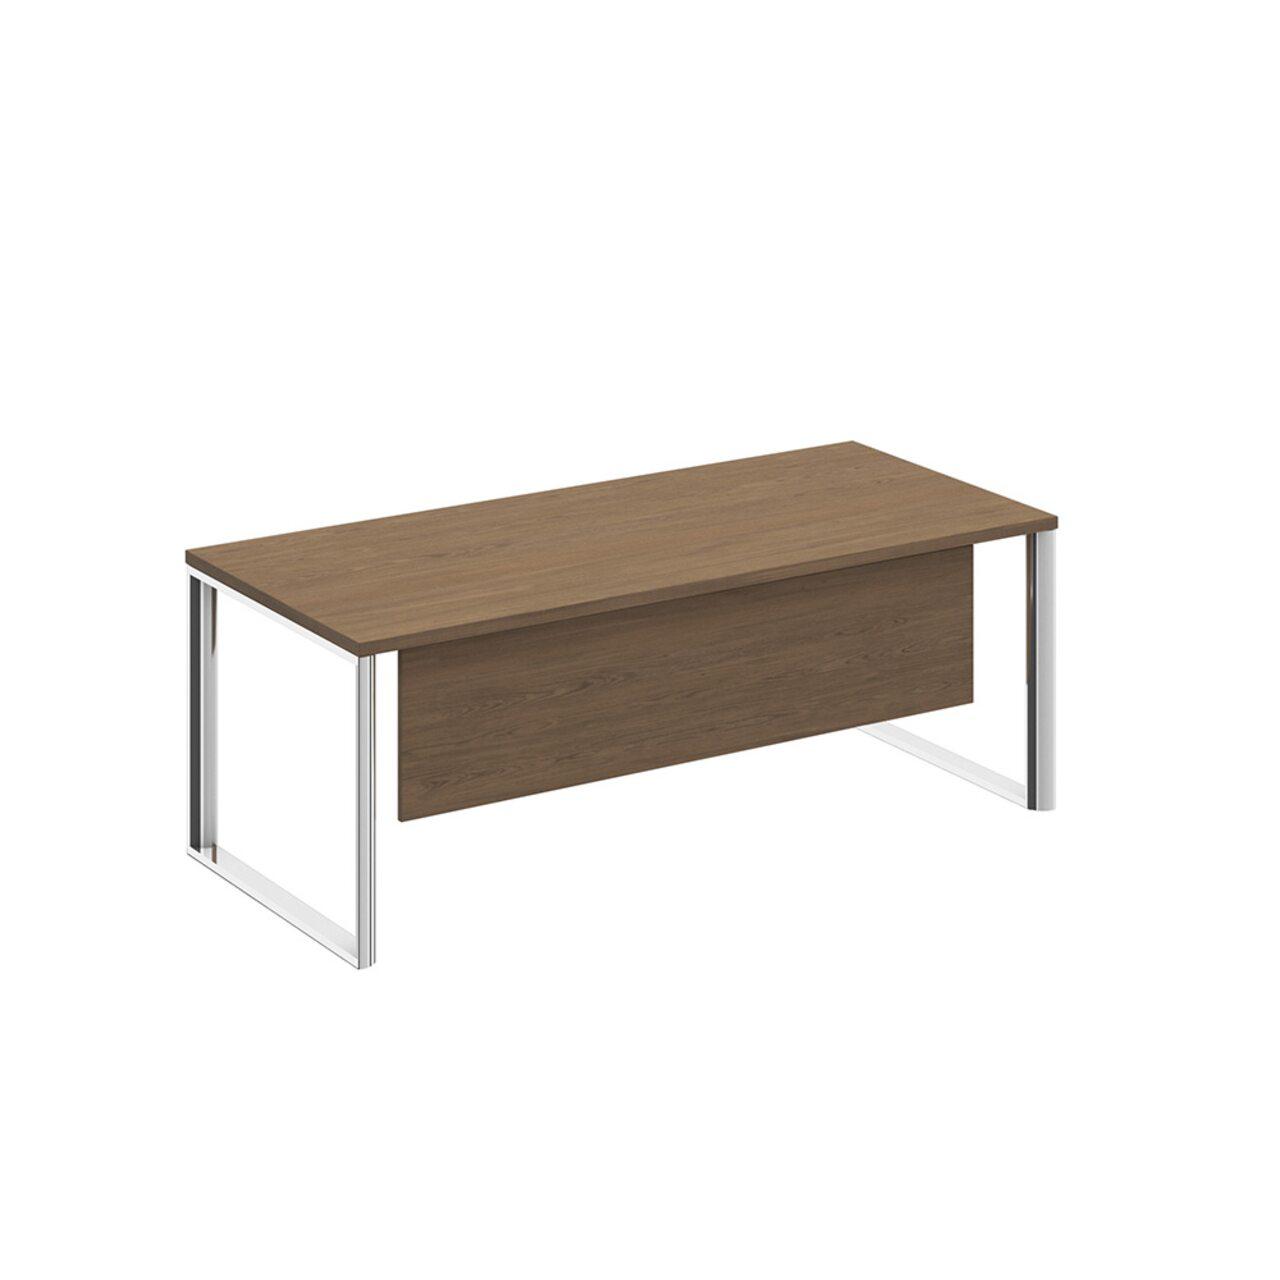 Стол руководителя  ORION 200x90x75 - фото 1